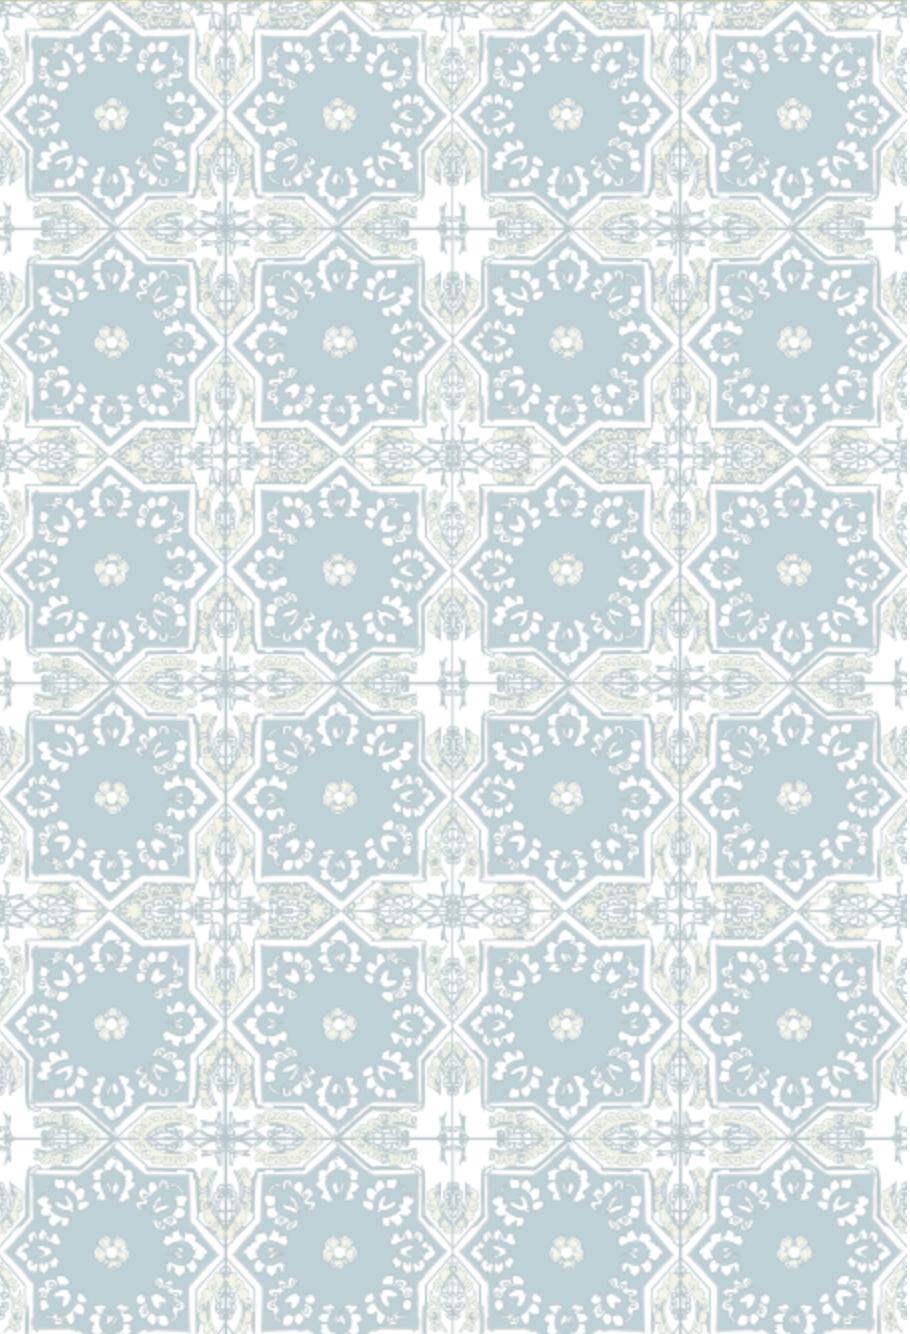 moroccan tile spanish tile eucalyptus fabric aqua beige tan mexican tile wall paper home decor design